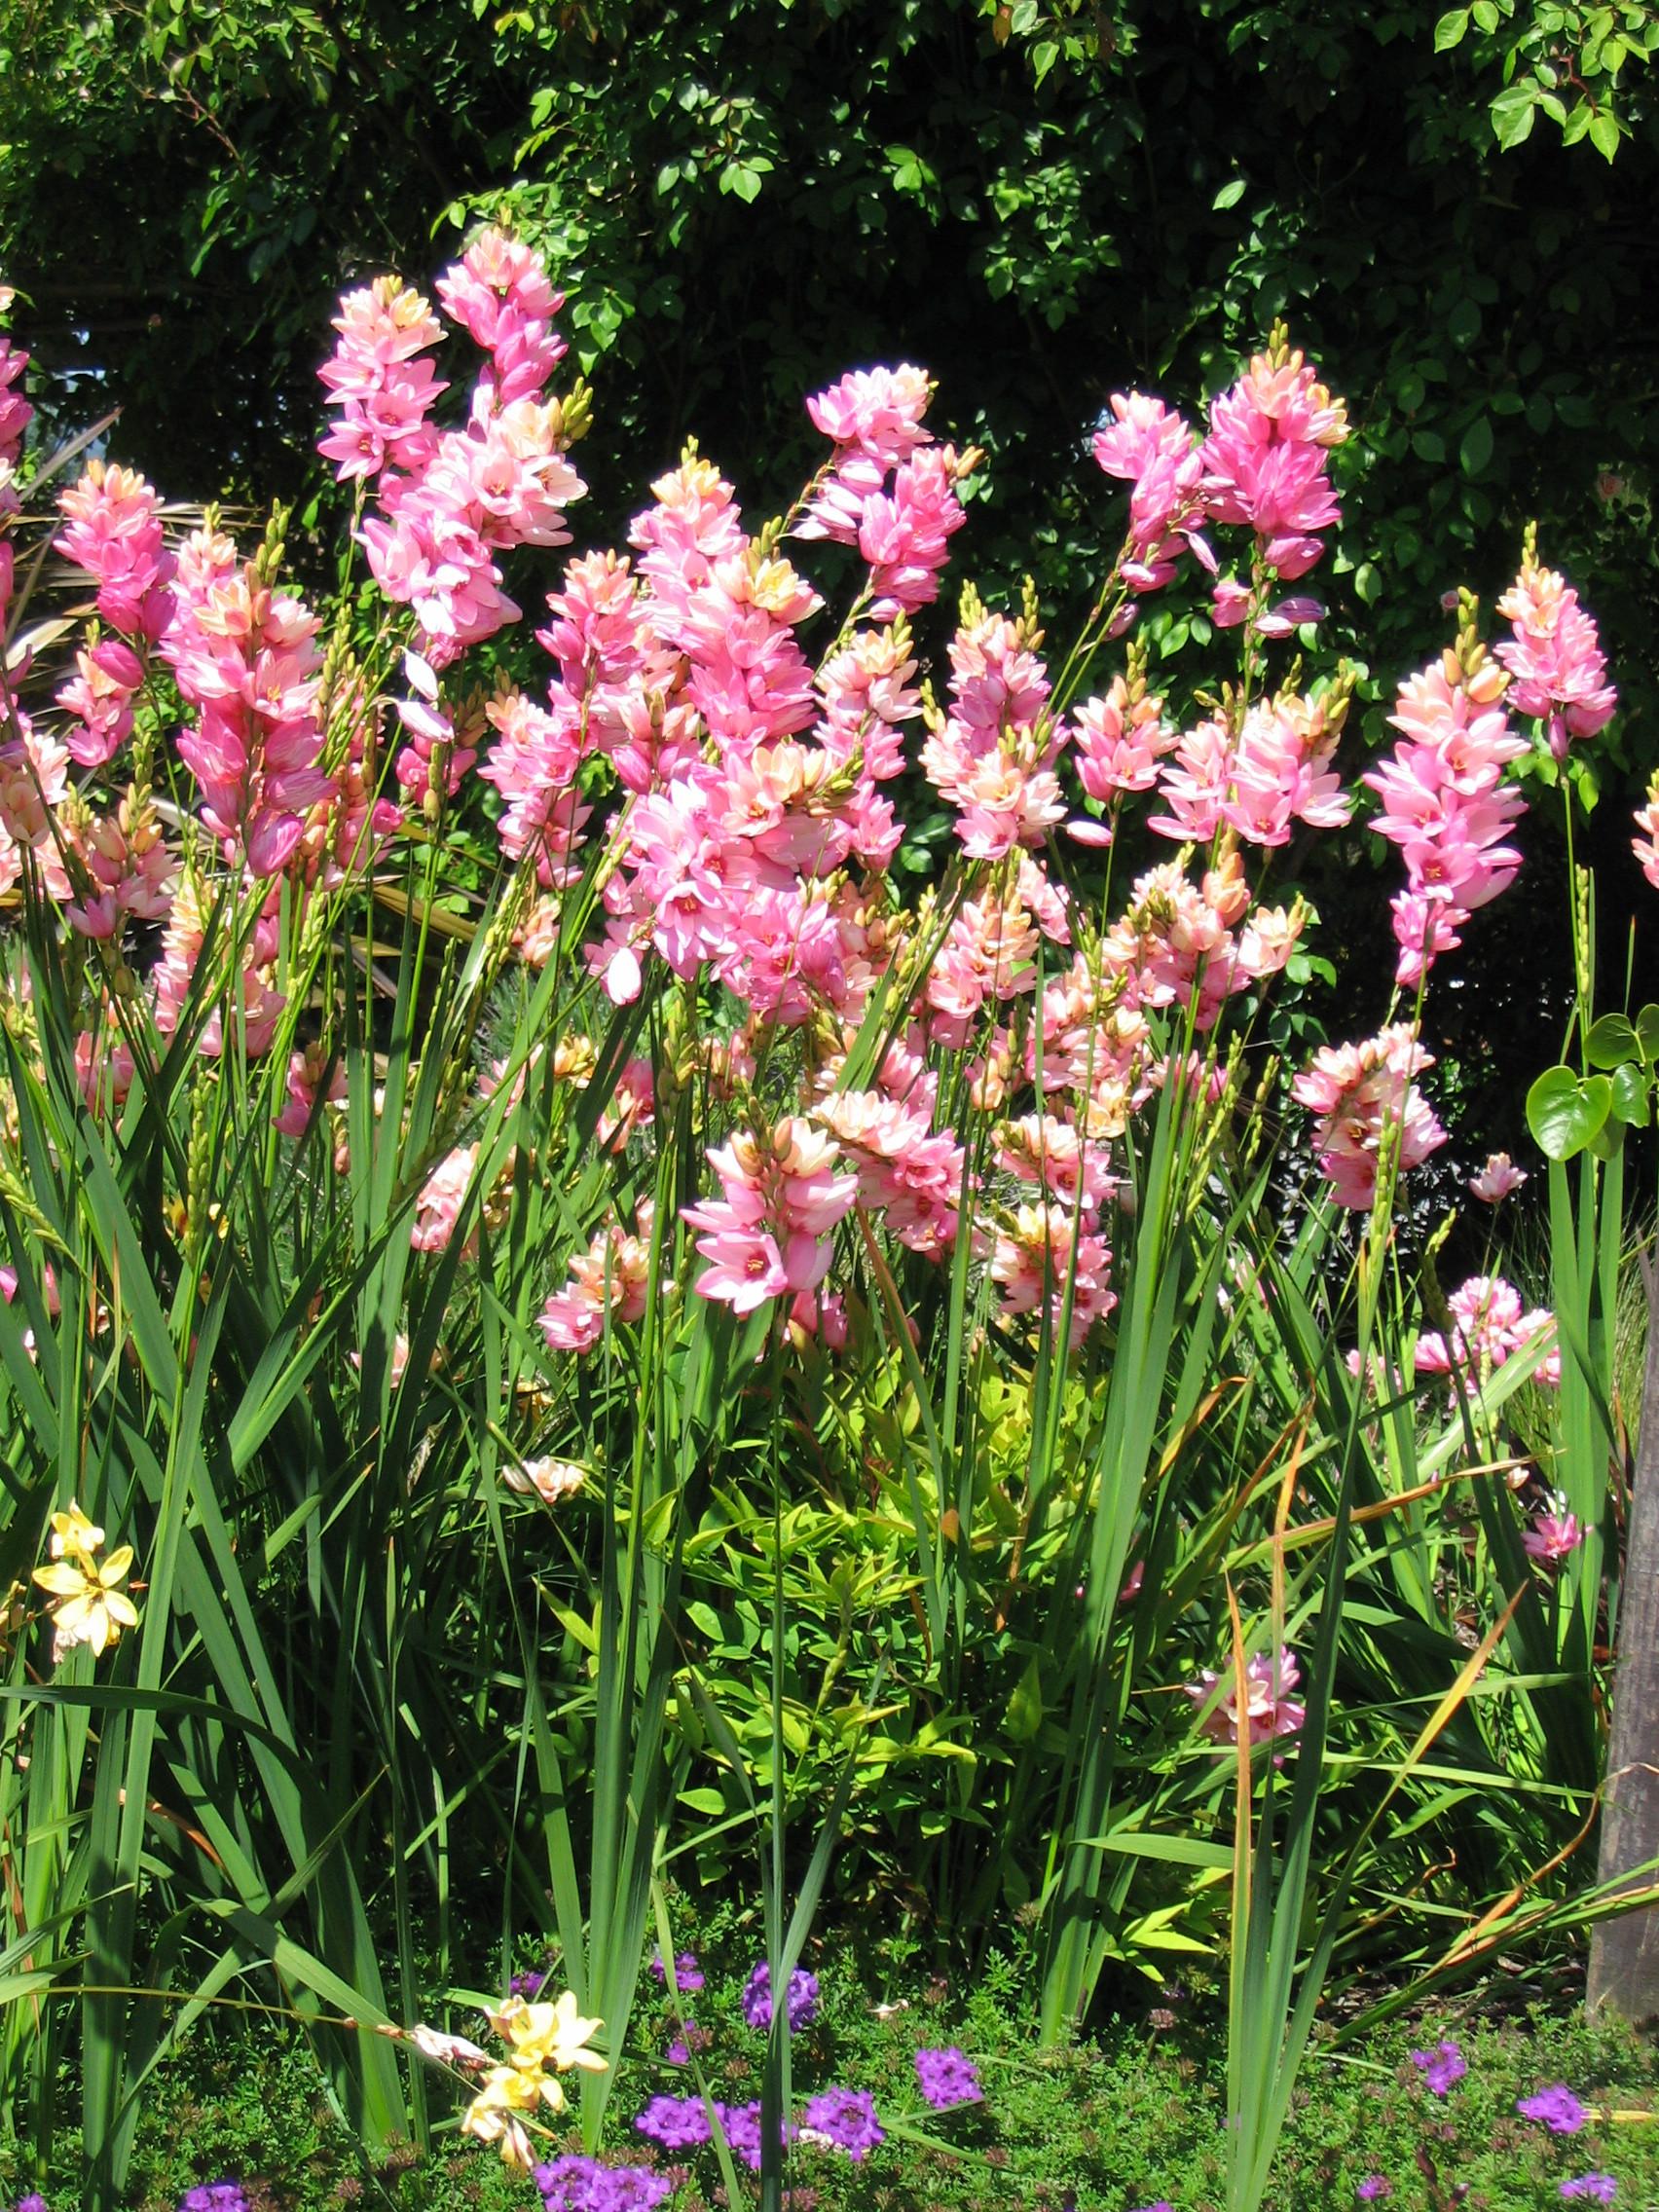 Ixia African Corn Lilies